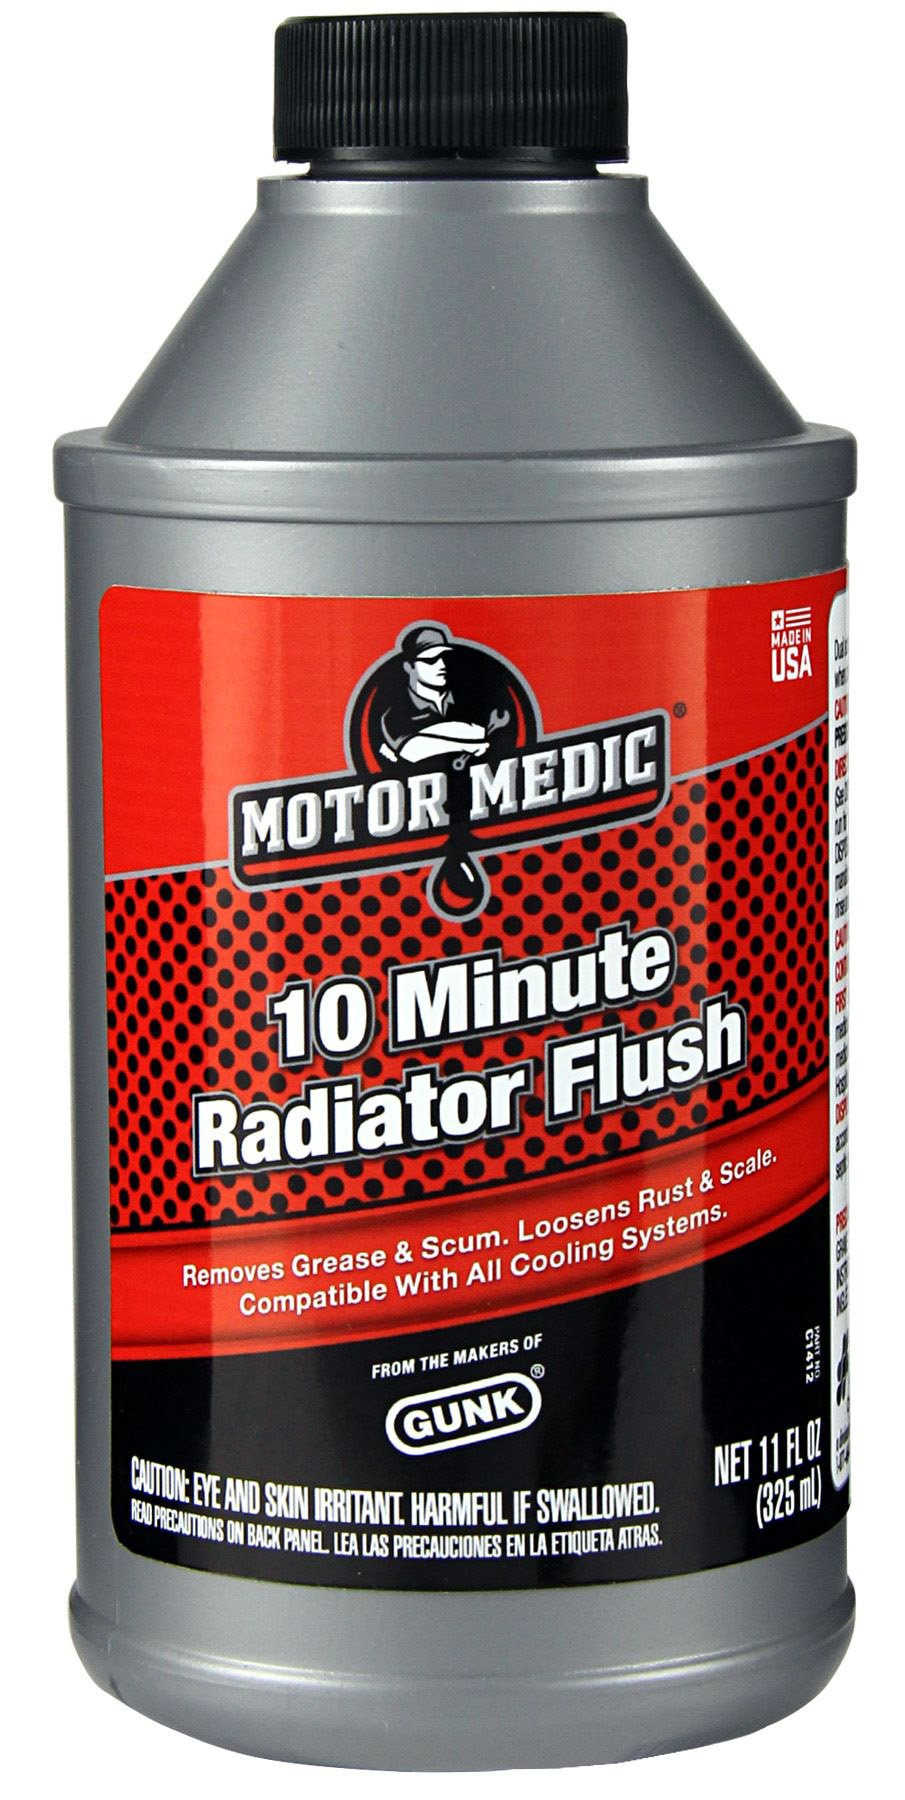 Niteo Motor Medic C1412-12PK 10-Minute Radiator Flush - 11 oz, (Case of 12) by Niteo